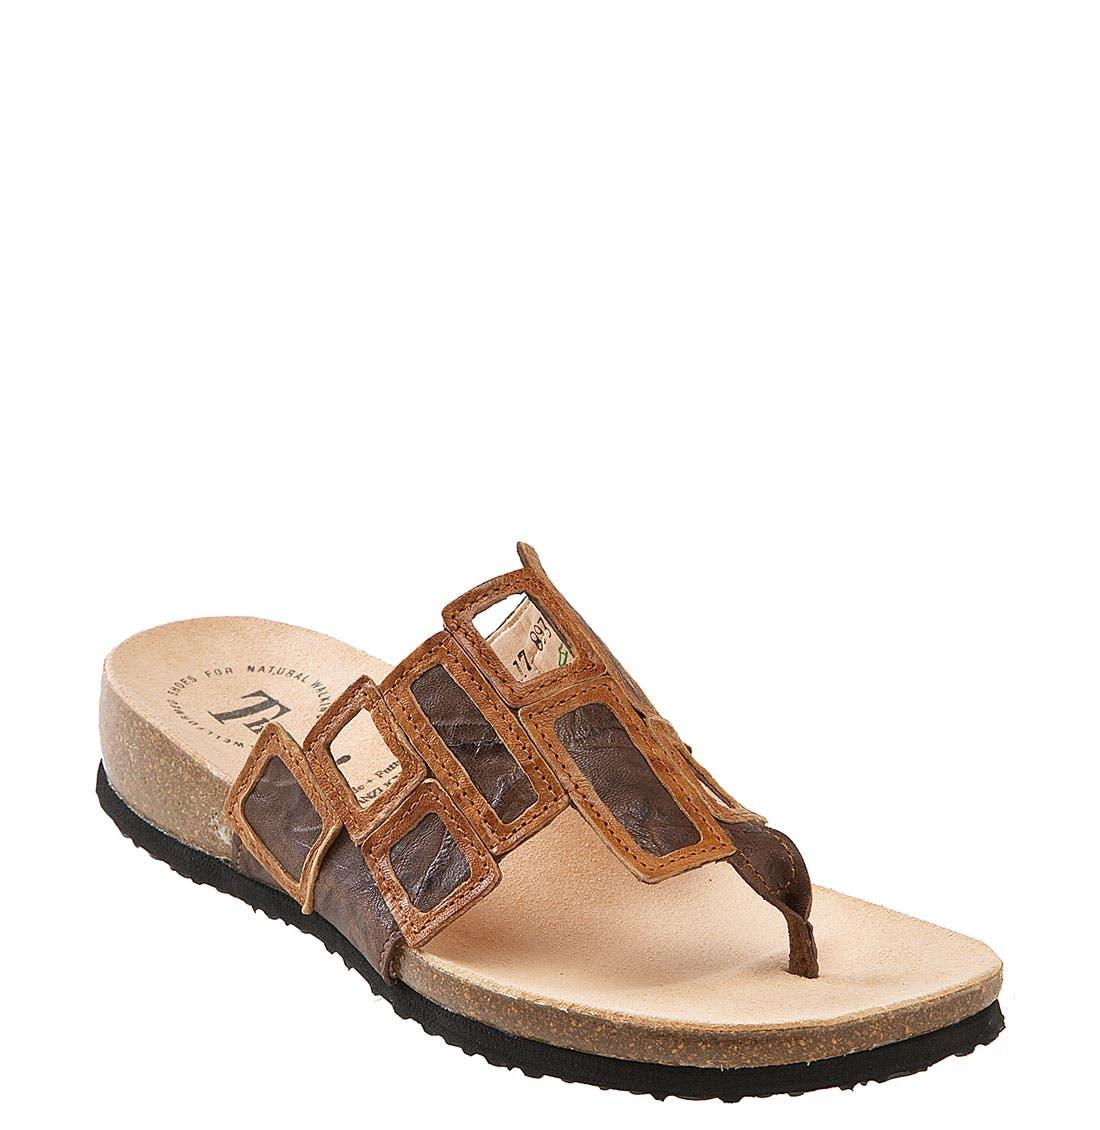 Alternate Image 1 Selected - Think! 'Julia Window' Sandal